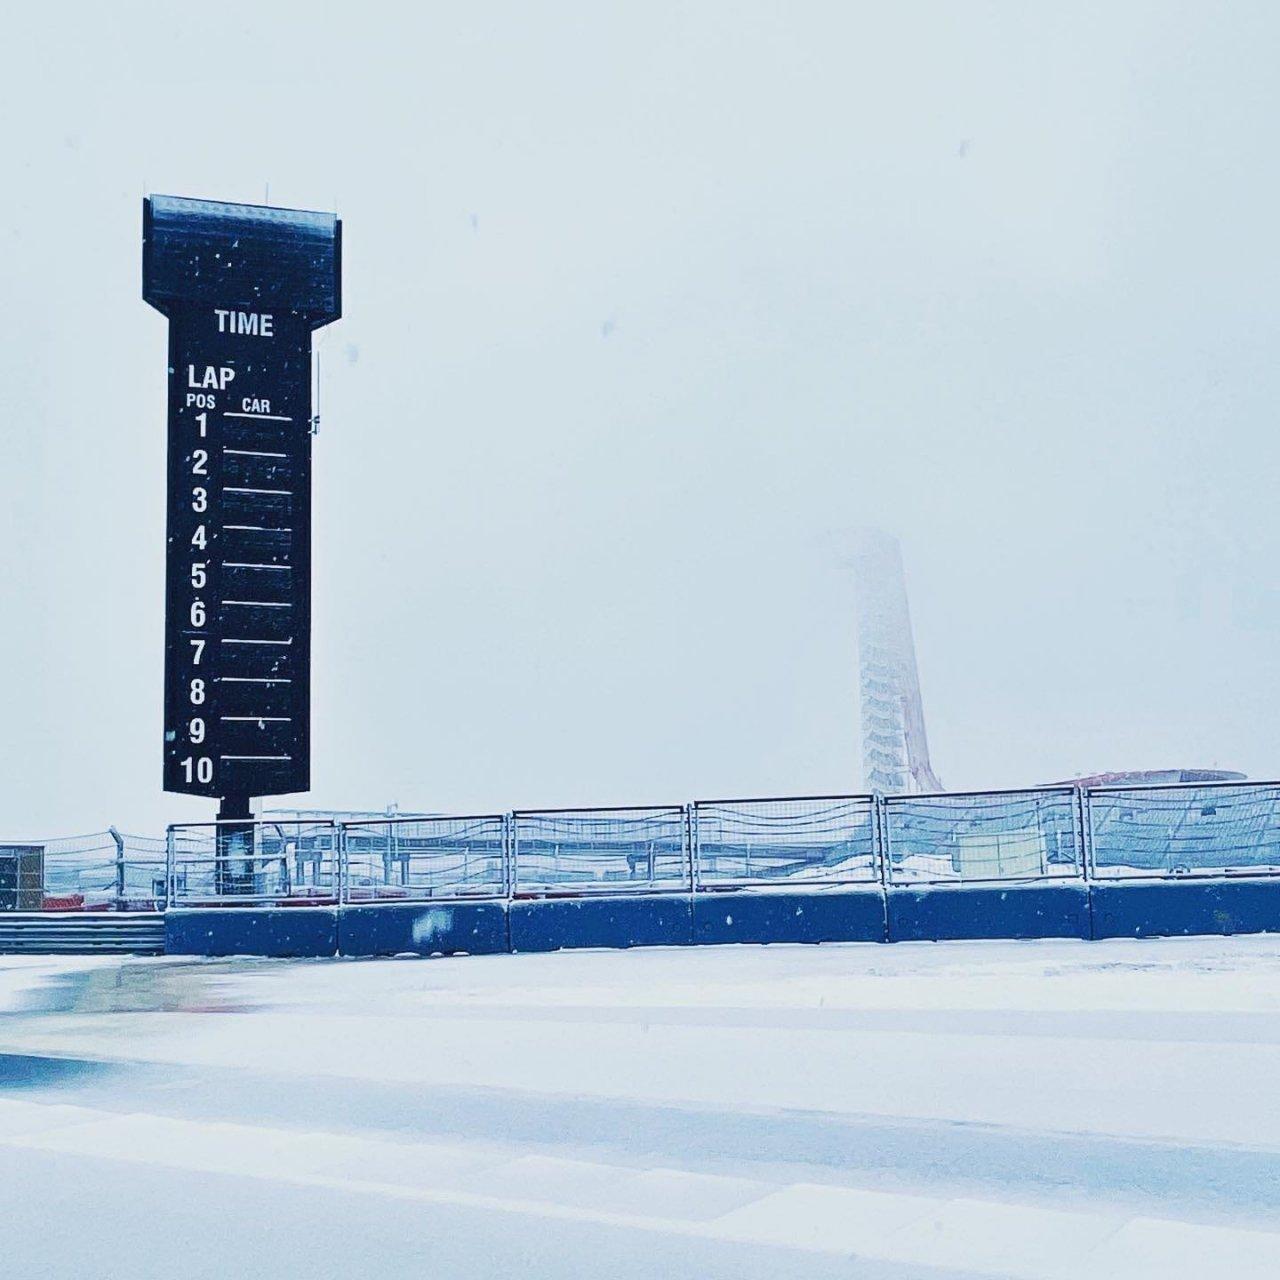 Circuit of the Americas - Snow fall